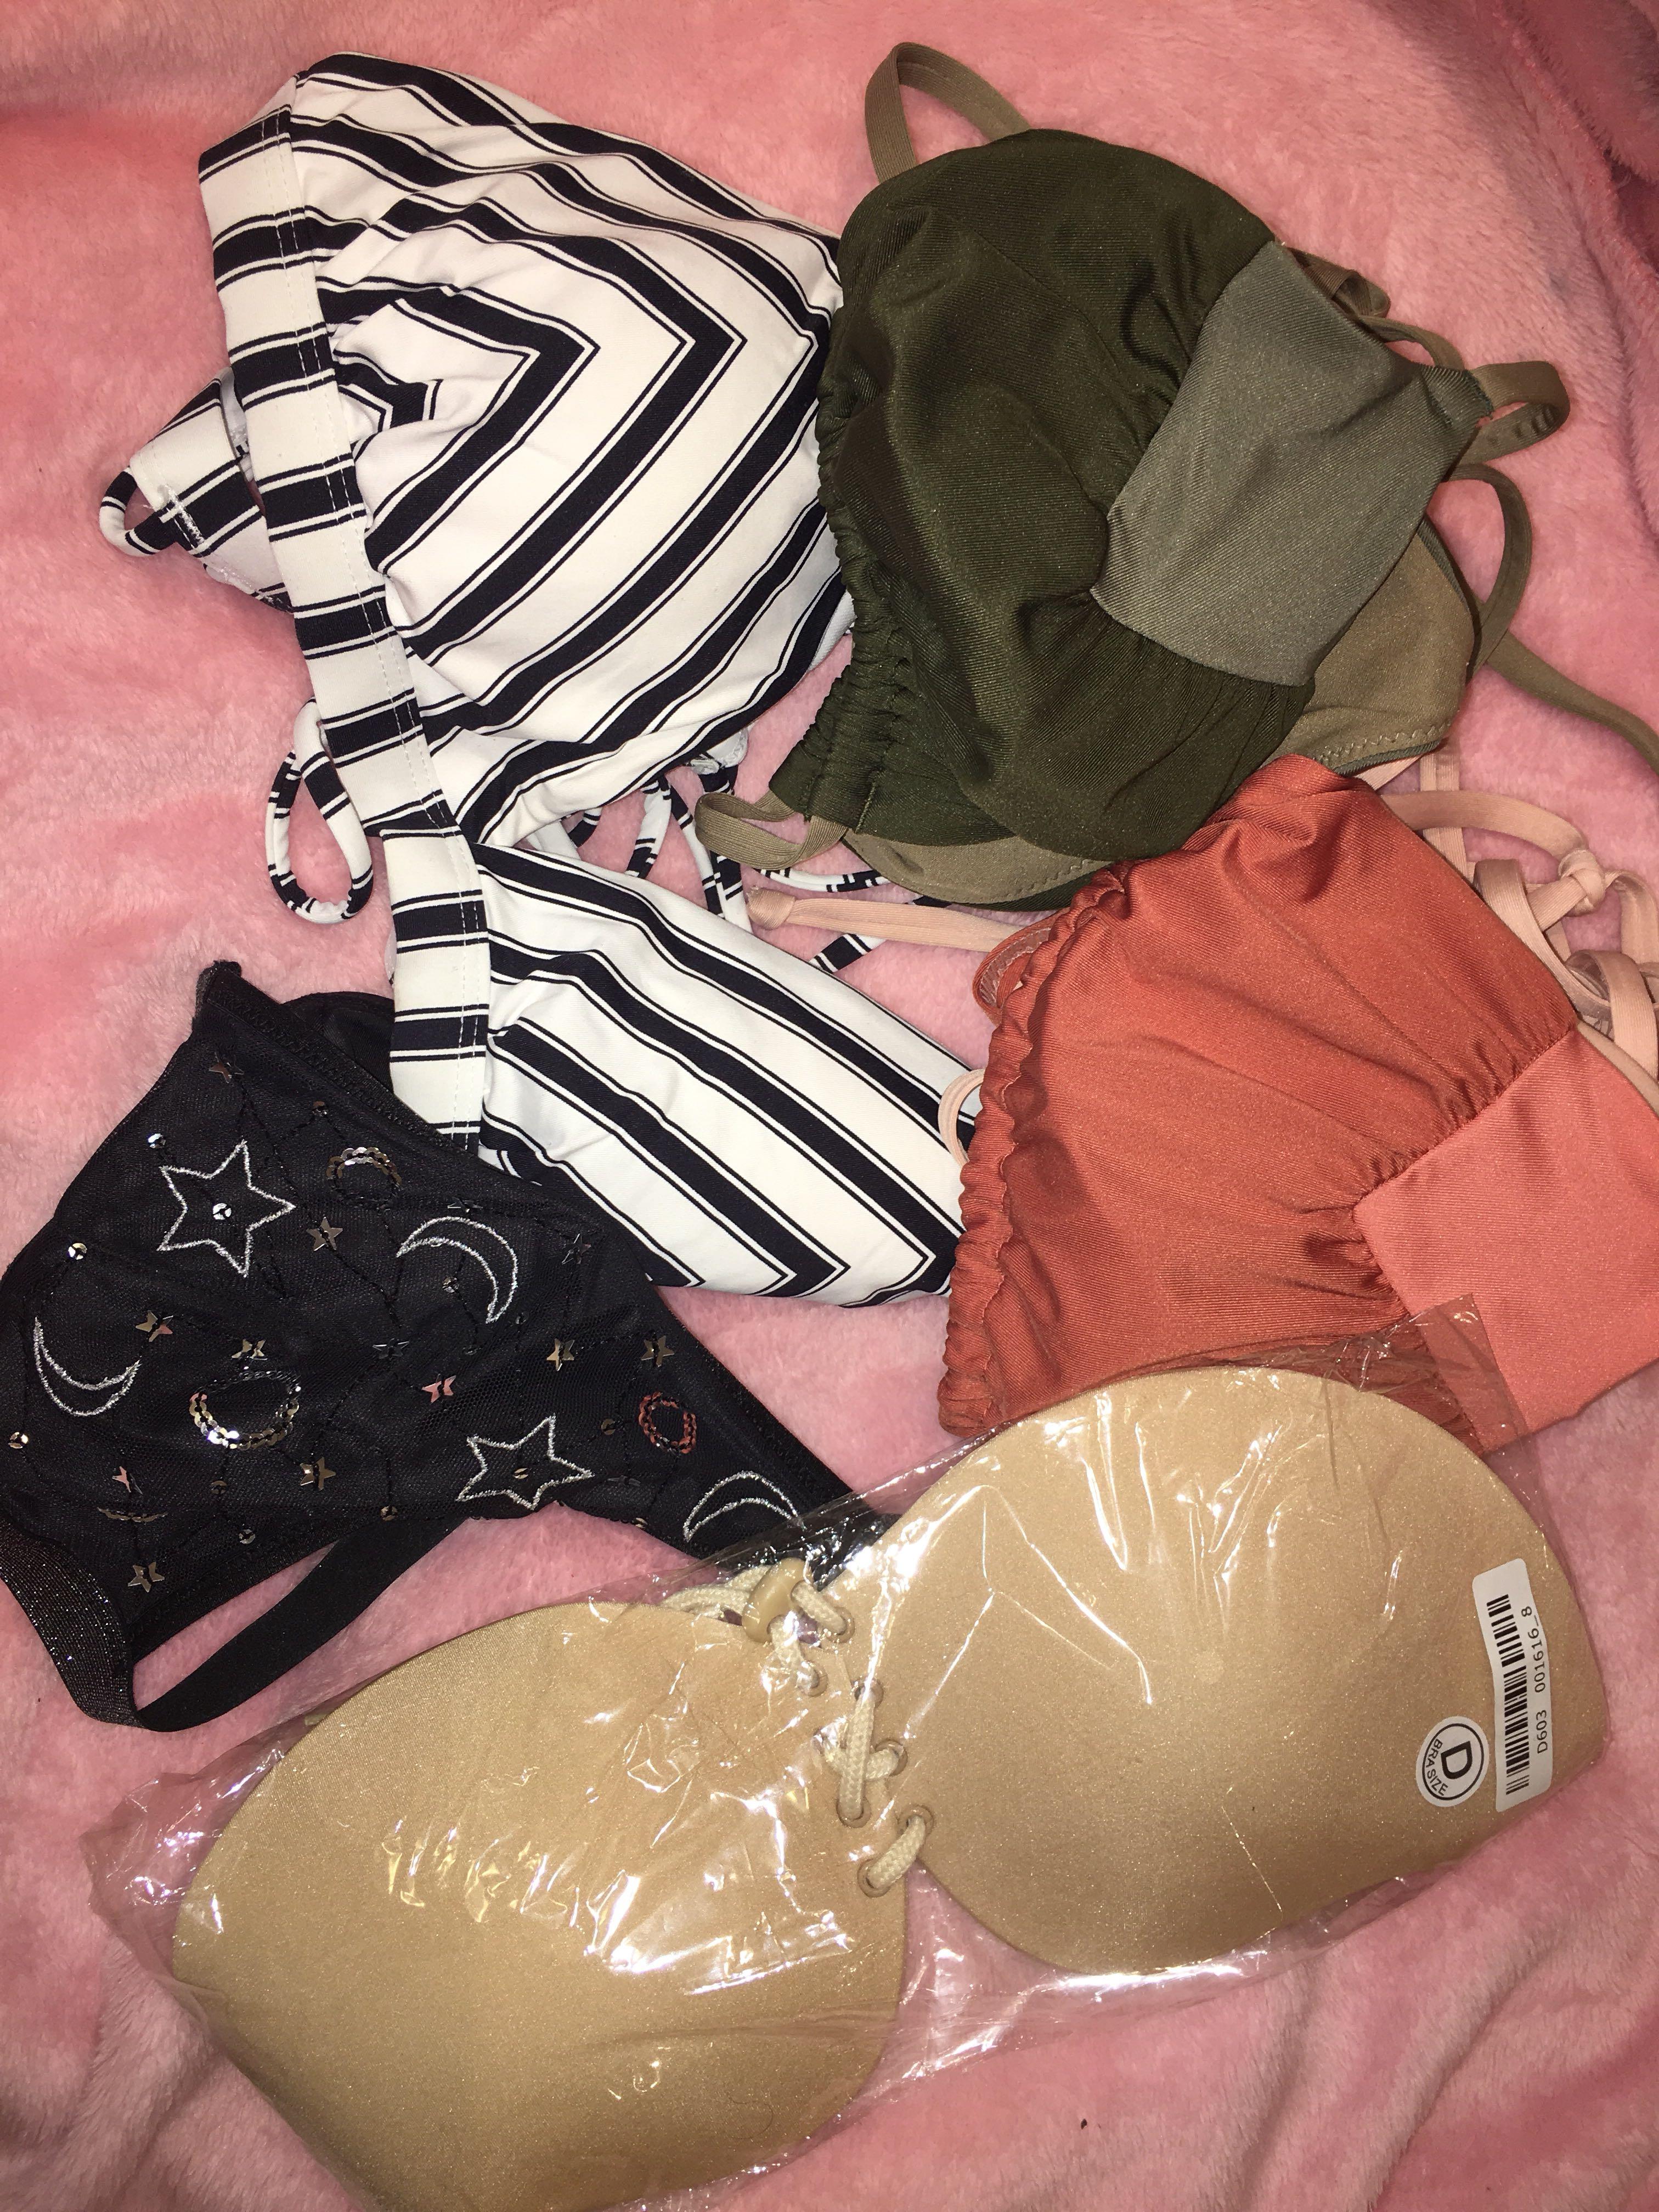 Bikini Tops, New Silicone bra, VS Bralette